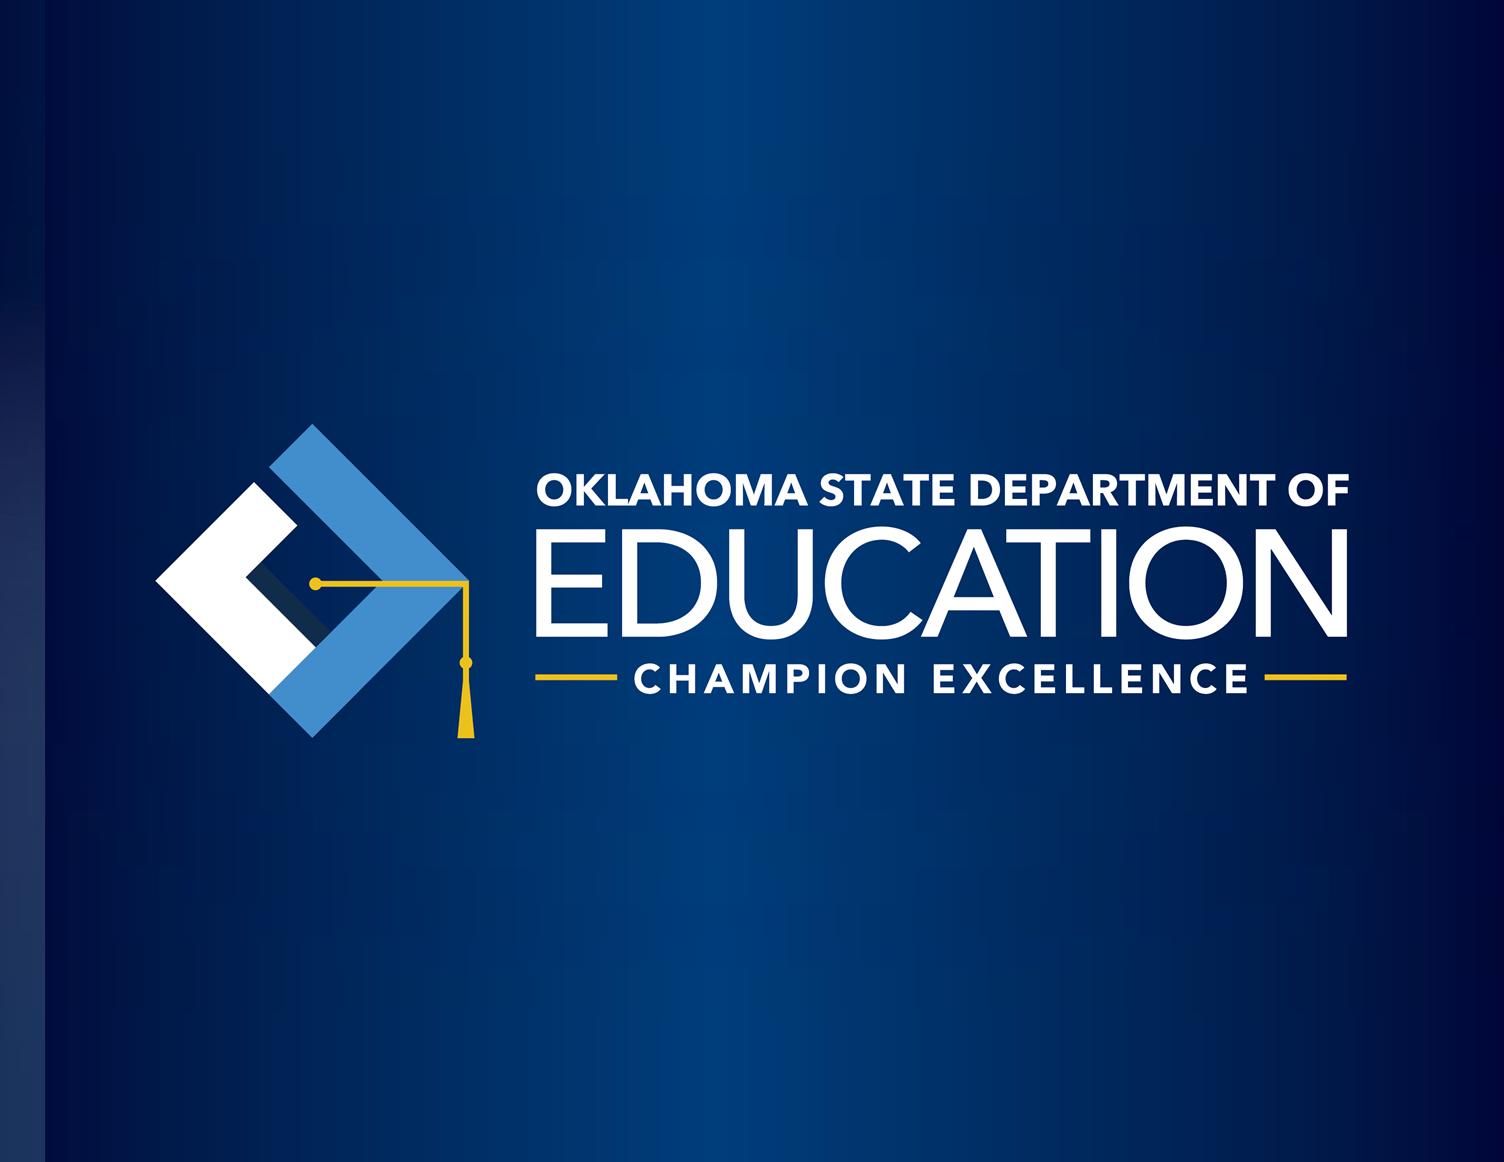 oklahoma state department of education branding